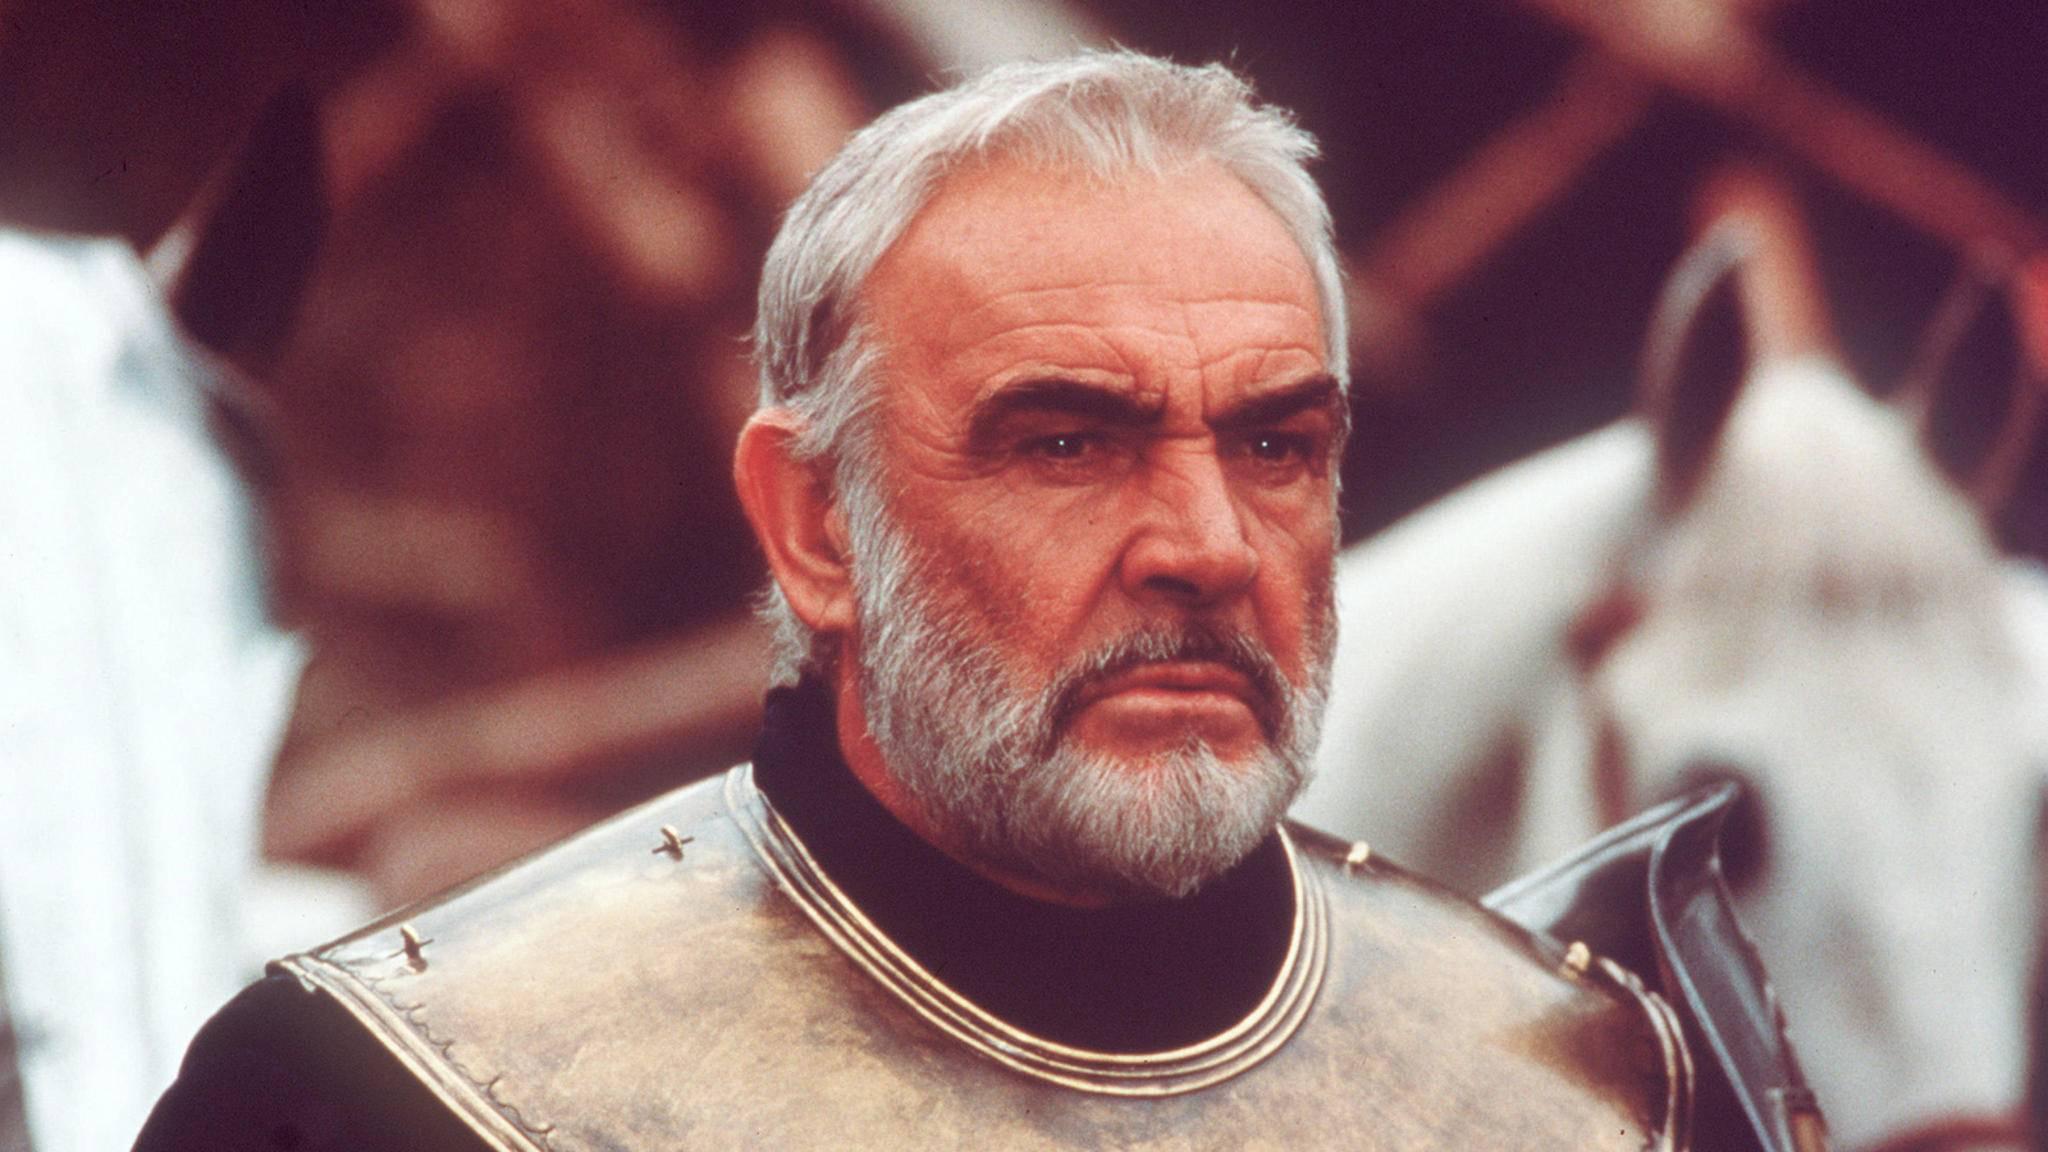 Sean Connery Der erste Ritter